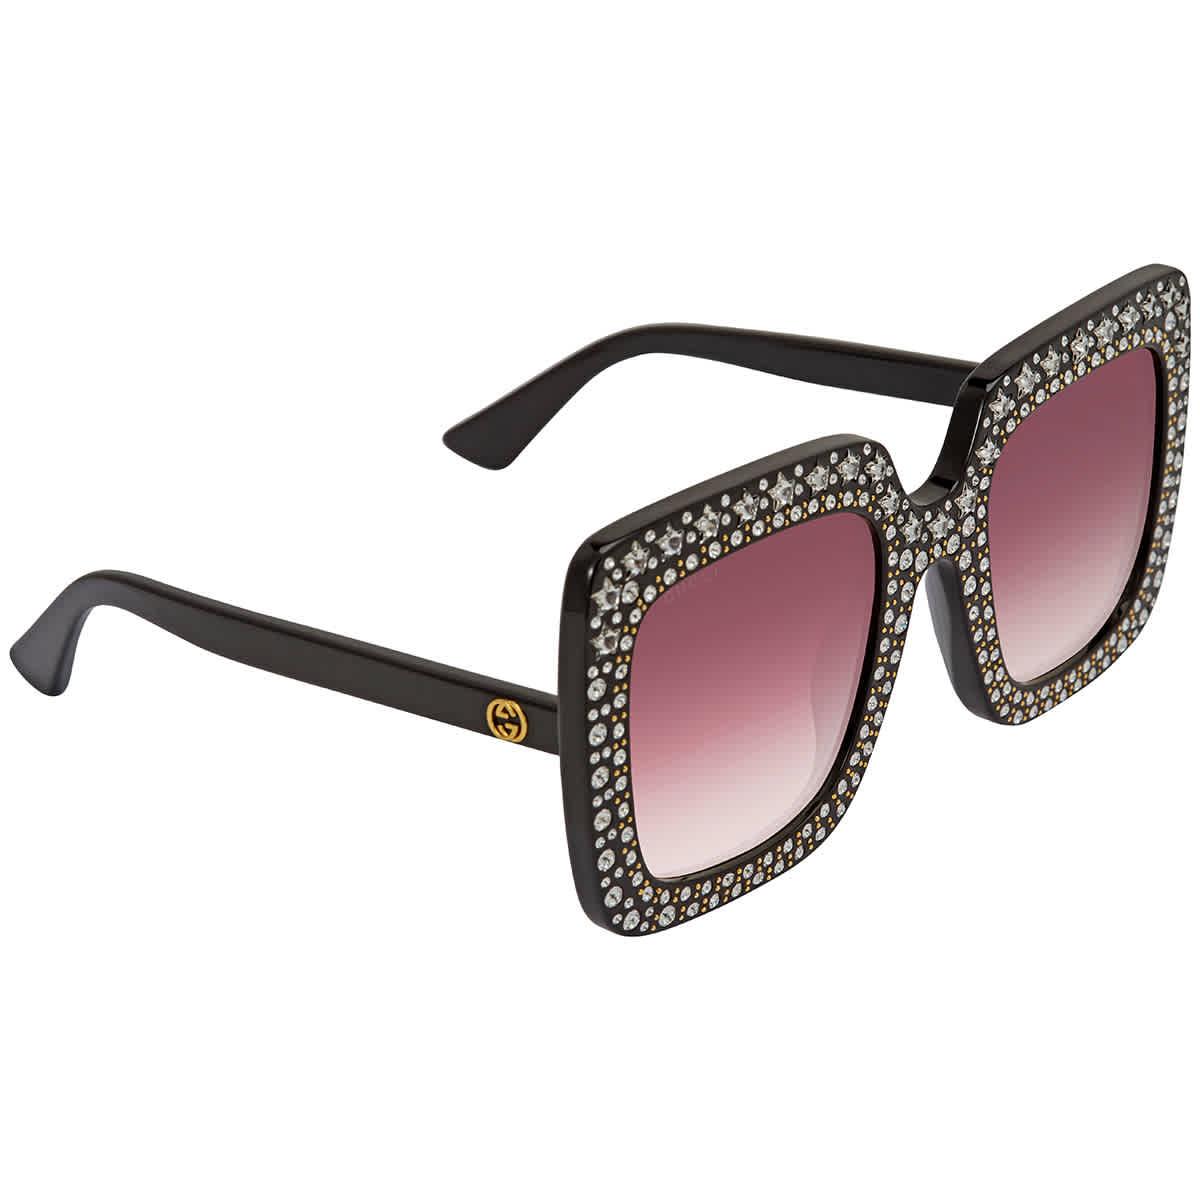 Gucci Red Gradient Square Sunglasses Gg0148s 005 53 In Black,red